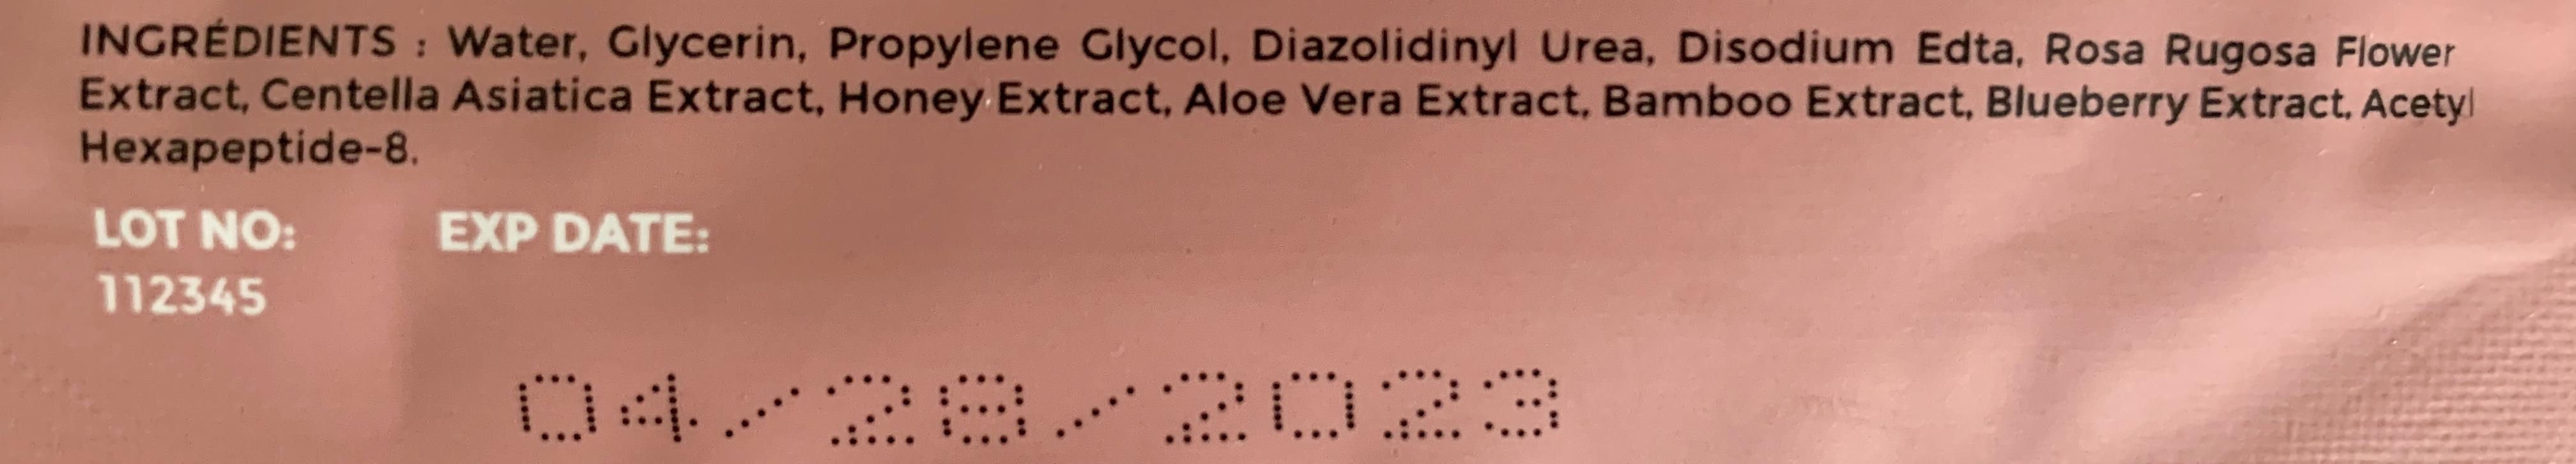 Liste d'ingrédients DermaV de Dermalights